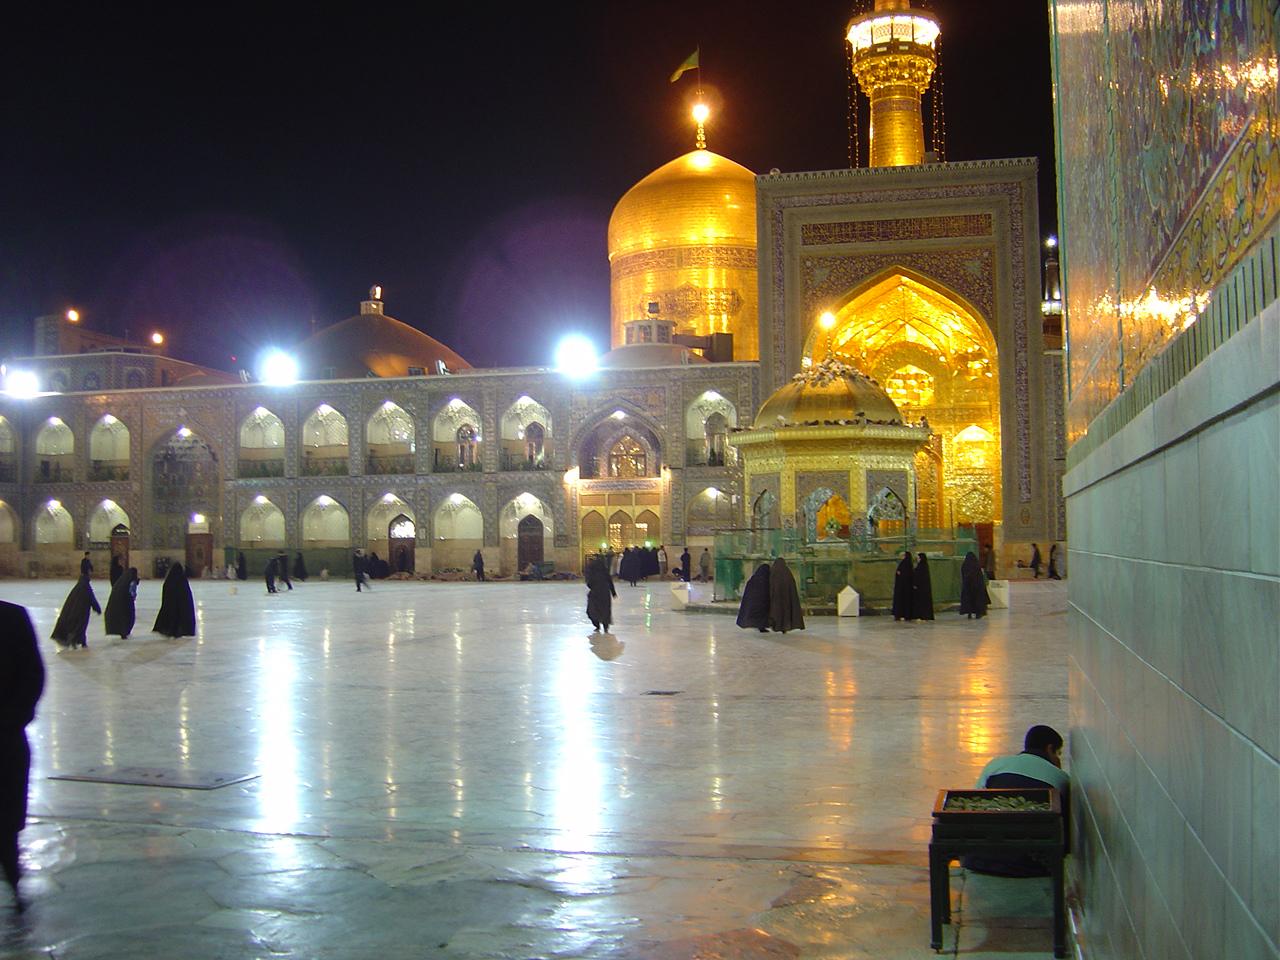 http://www.sibtayn.com/swf/gallery/images/shahrha/mashhad/reza/ghonbad_reza/pic3/pic85.jpg